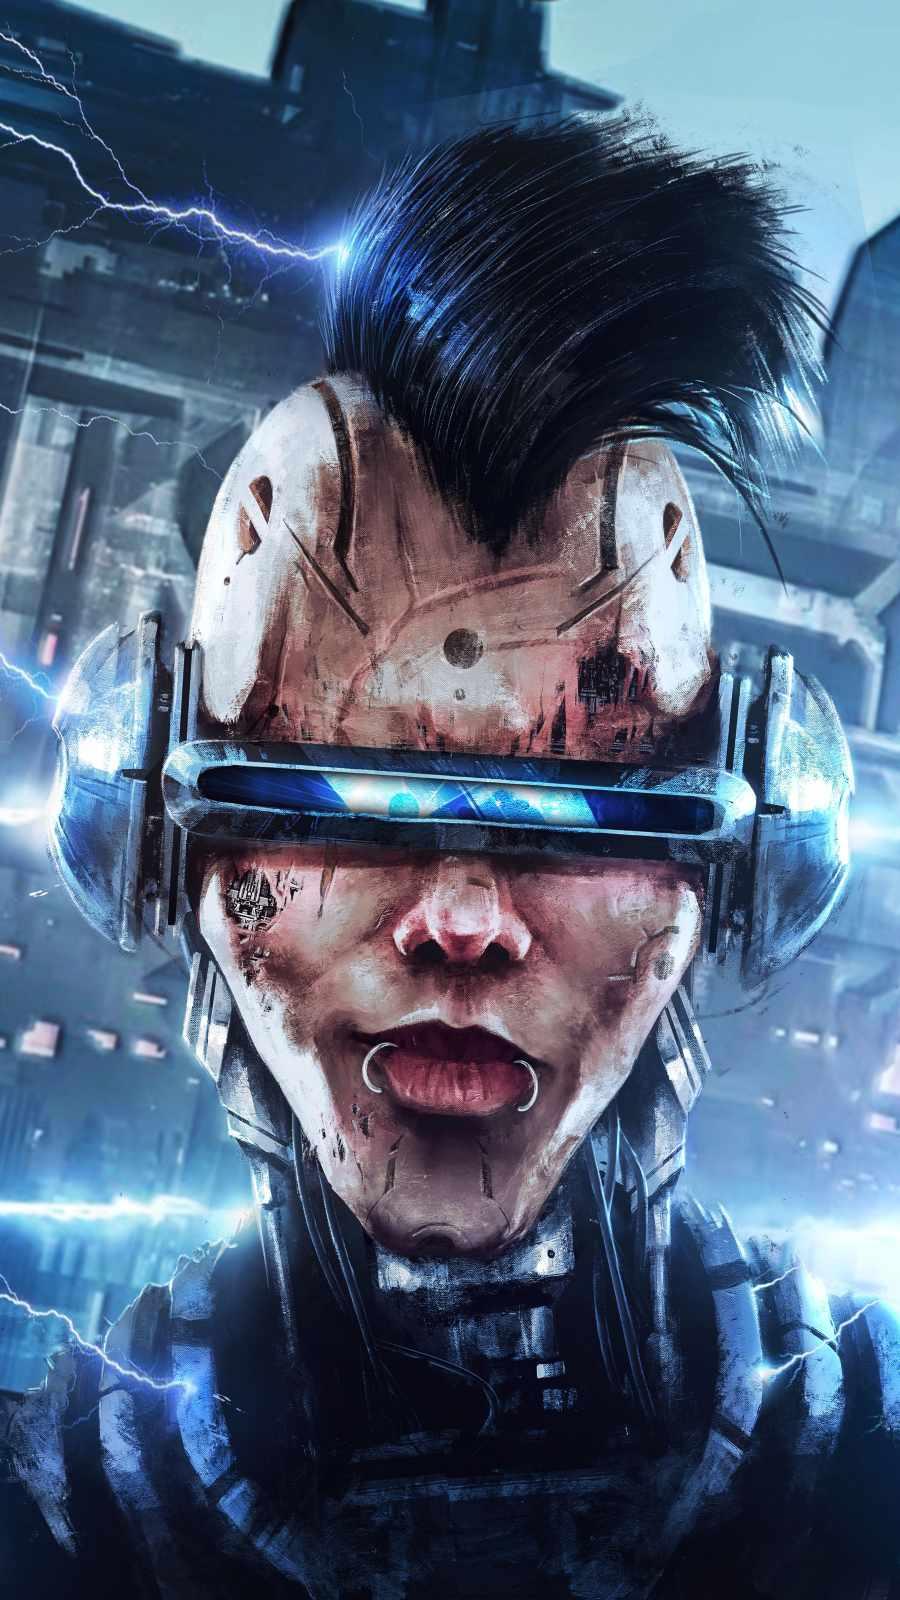 Cyborg Face iPhone Wallpaper